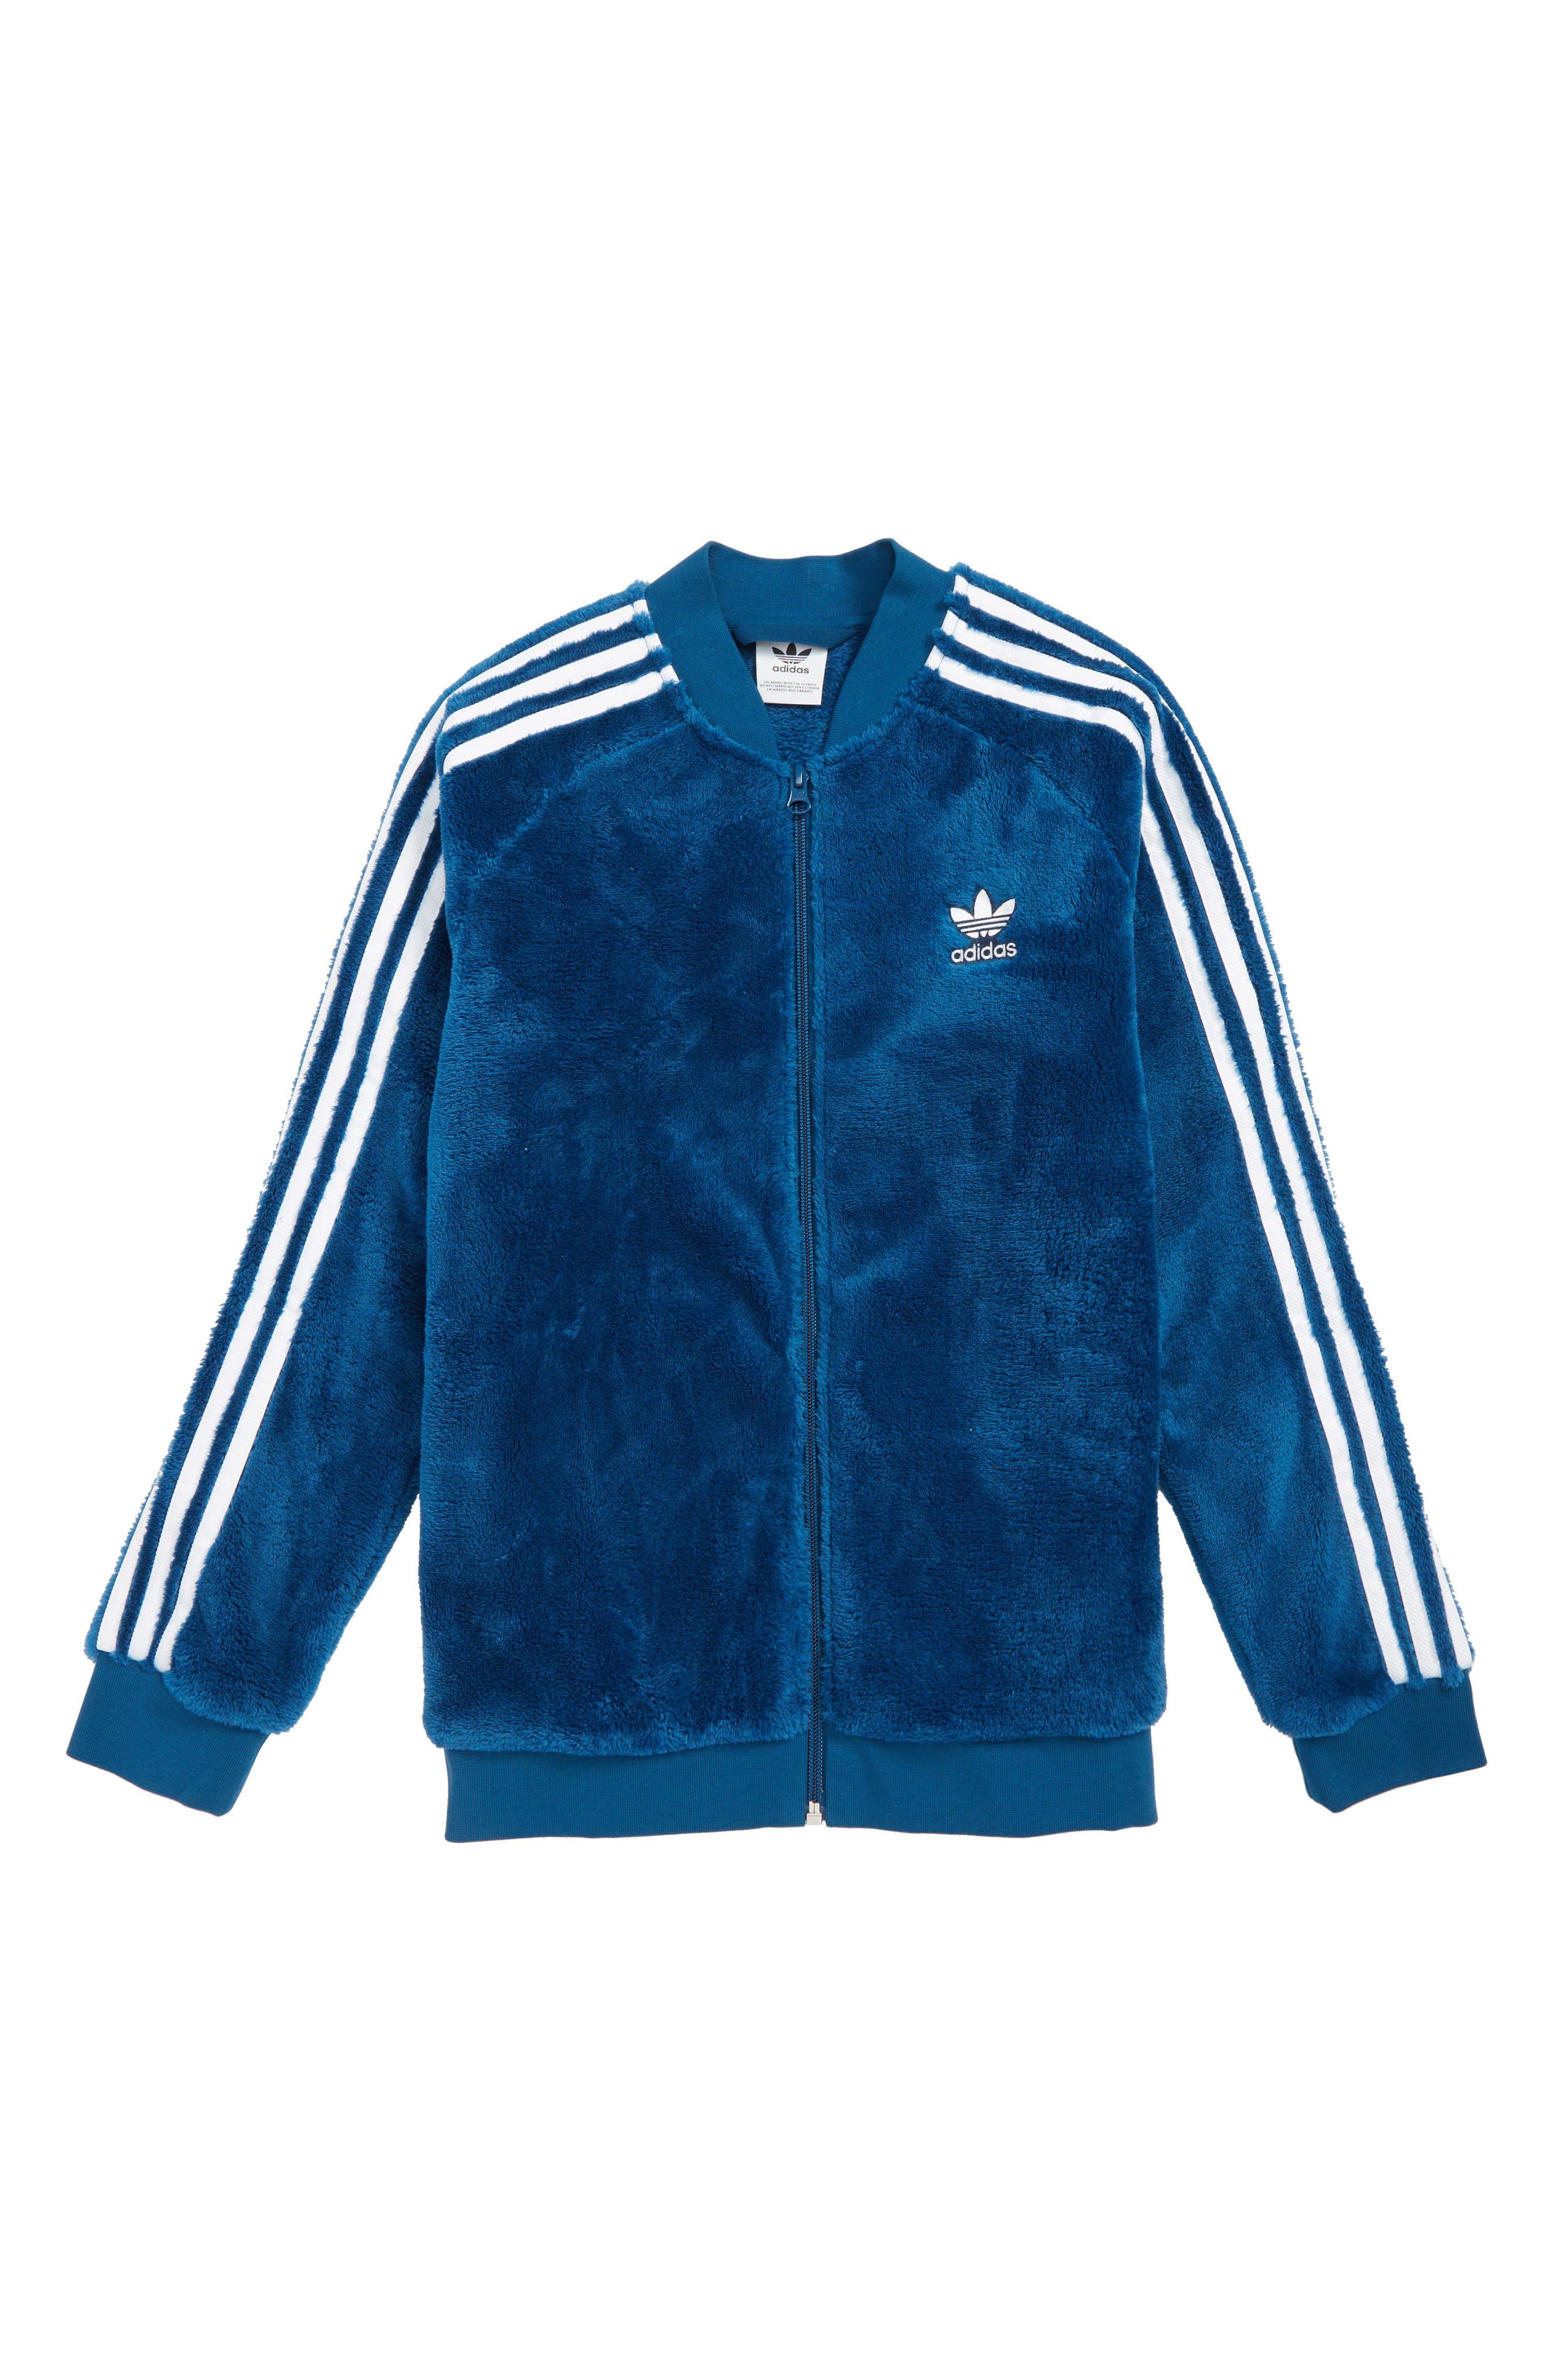 ADIDAS ORIGINALS, Winter SST Jacket, Main thumbnail 1, color, LEGEND MARINE/ WHITE